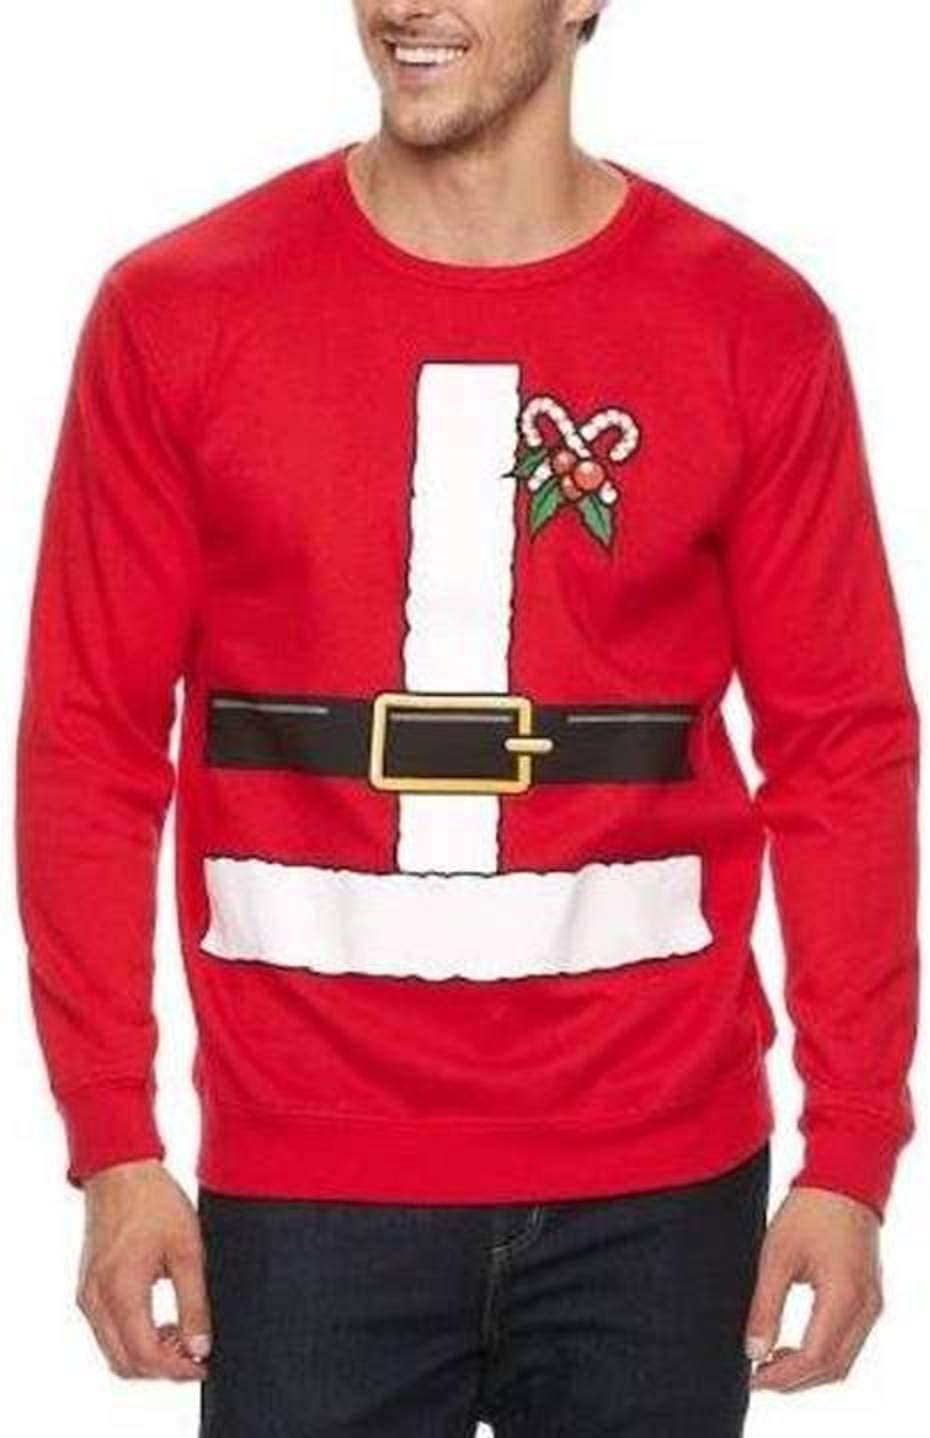 Holiday Fun Mens Big & Tall Long Sleeve Crewneck Fleece Ugly Christmas Sweatshirt (Red, LT)